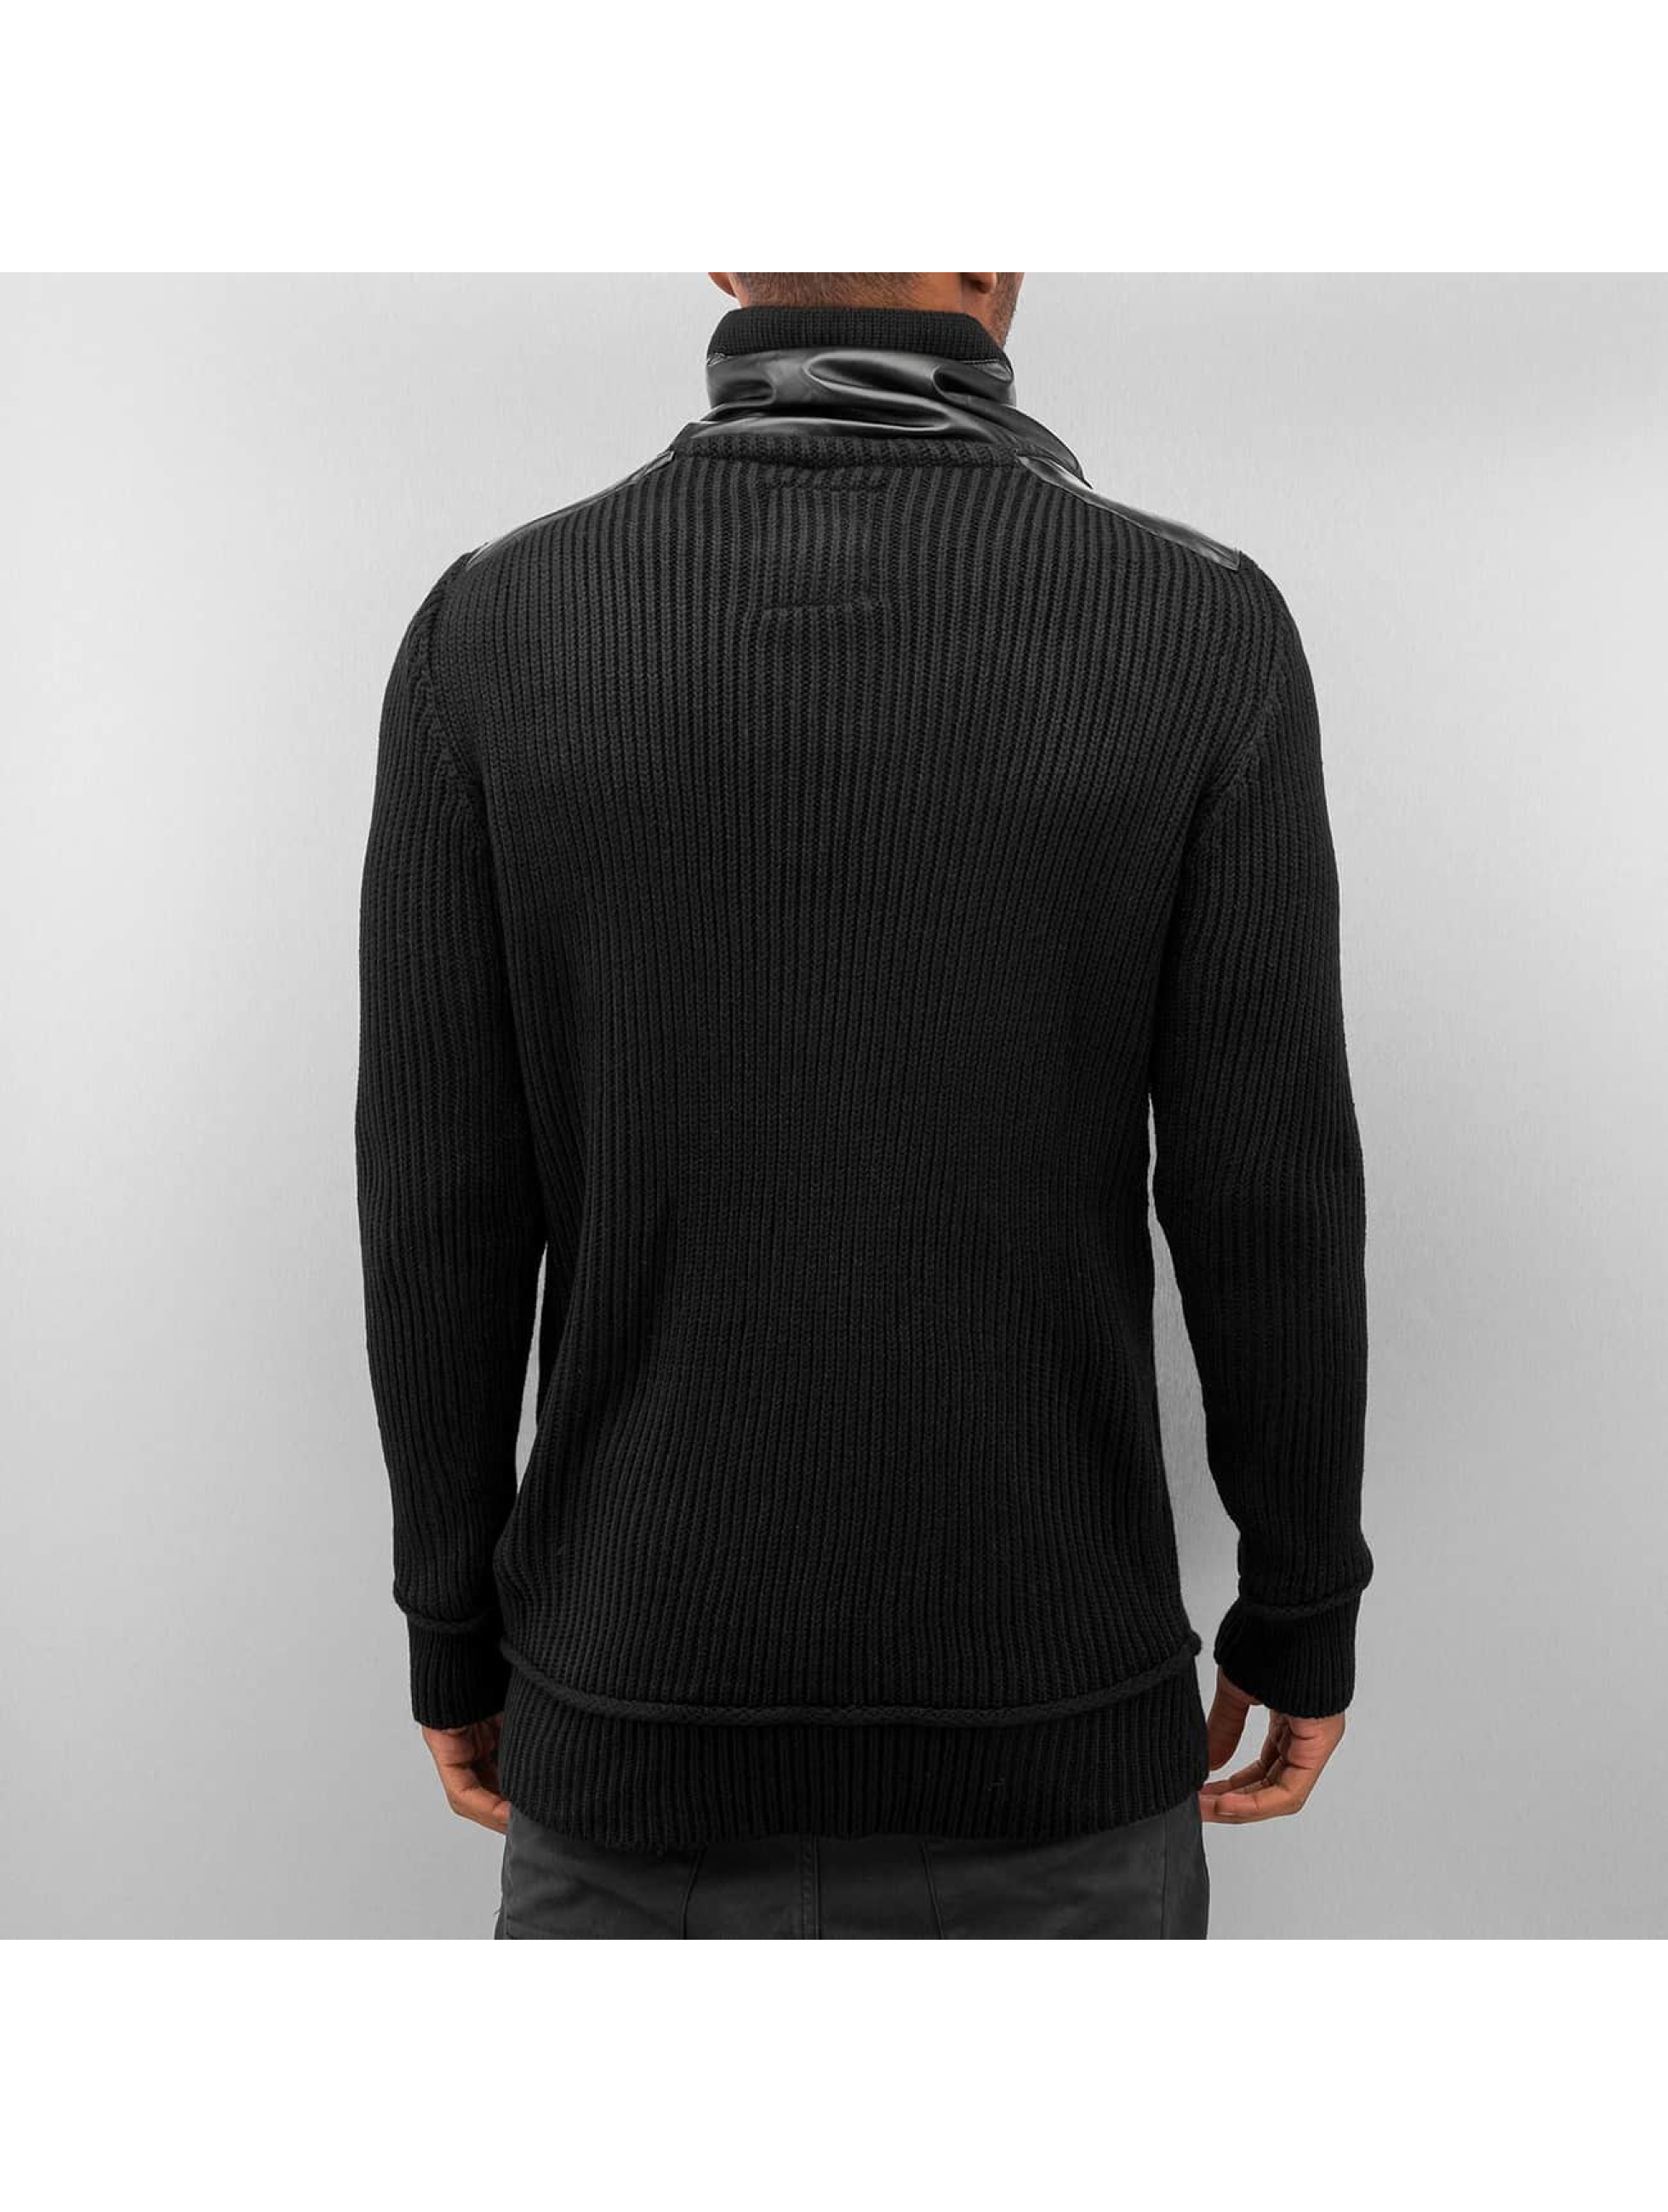 Bangastic Пуловер Knitted черный